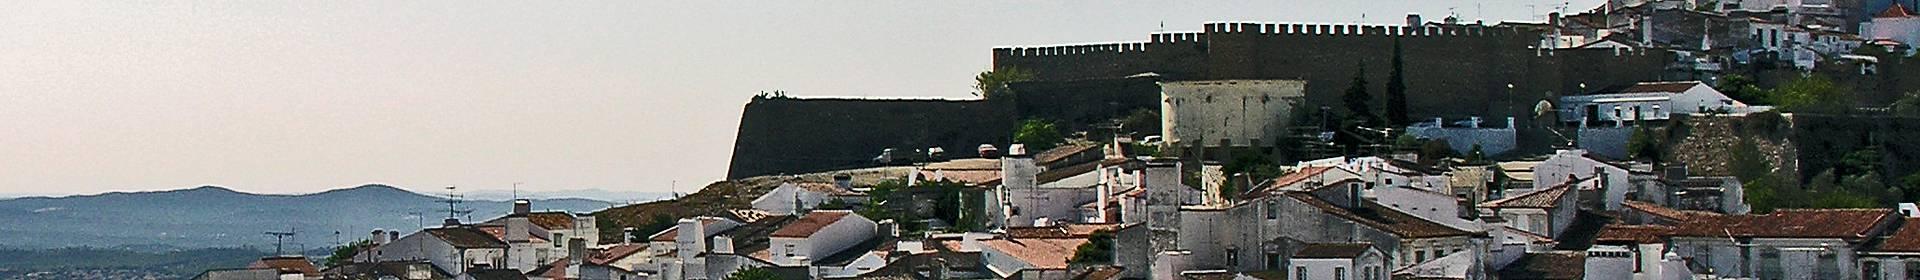 Estremoz Municipality